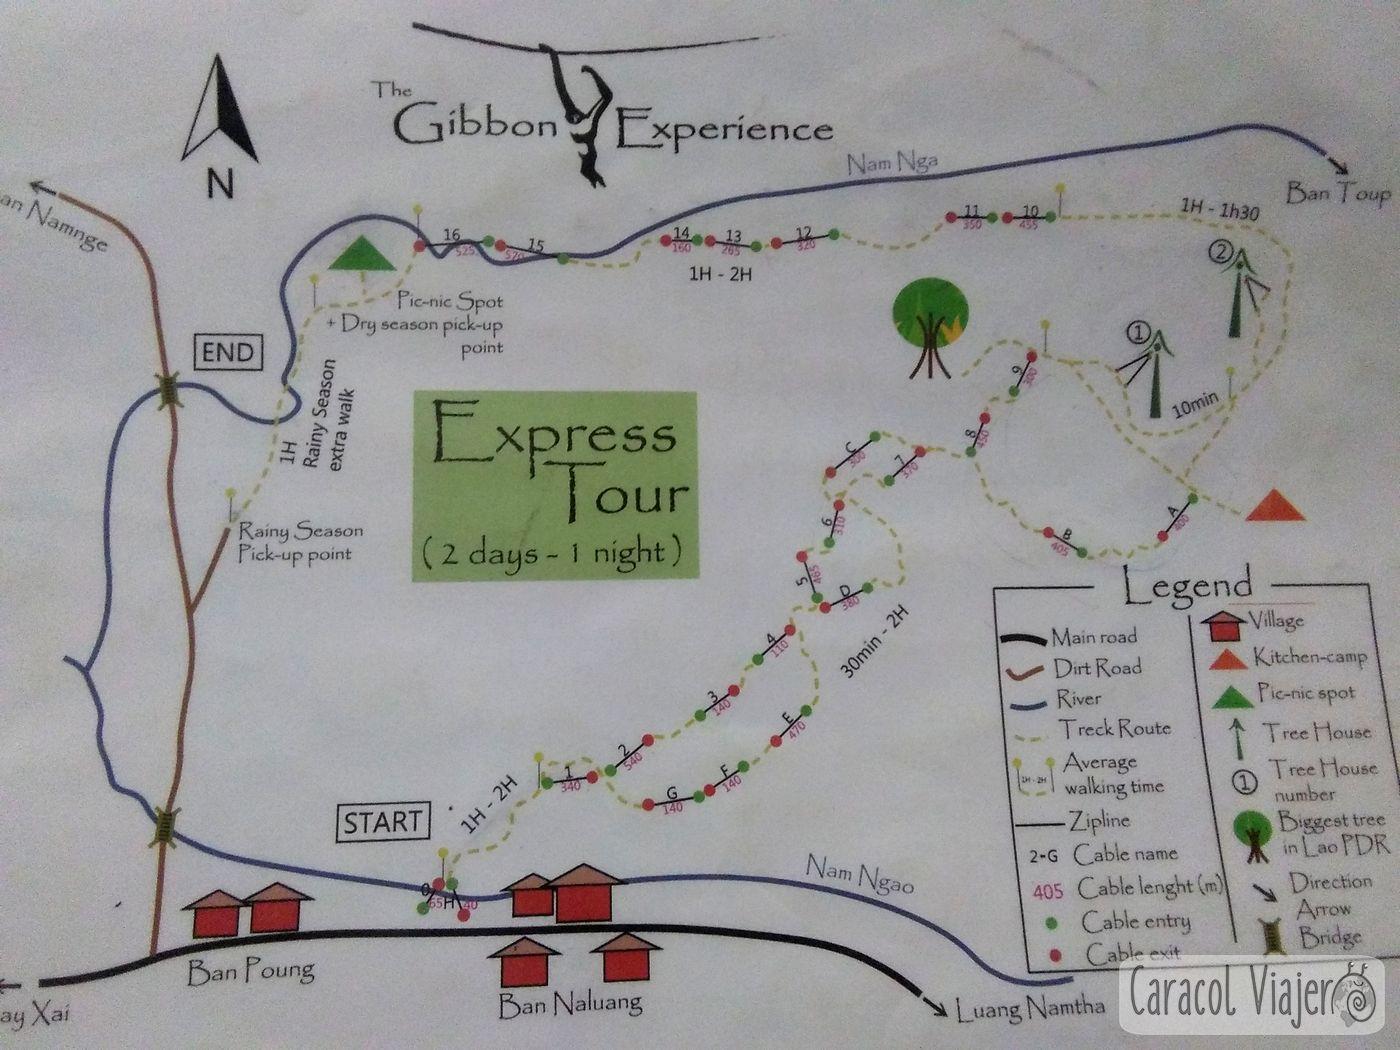 Express Tour mapa Gibbon Experience